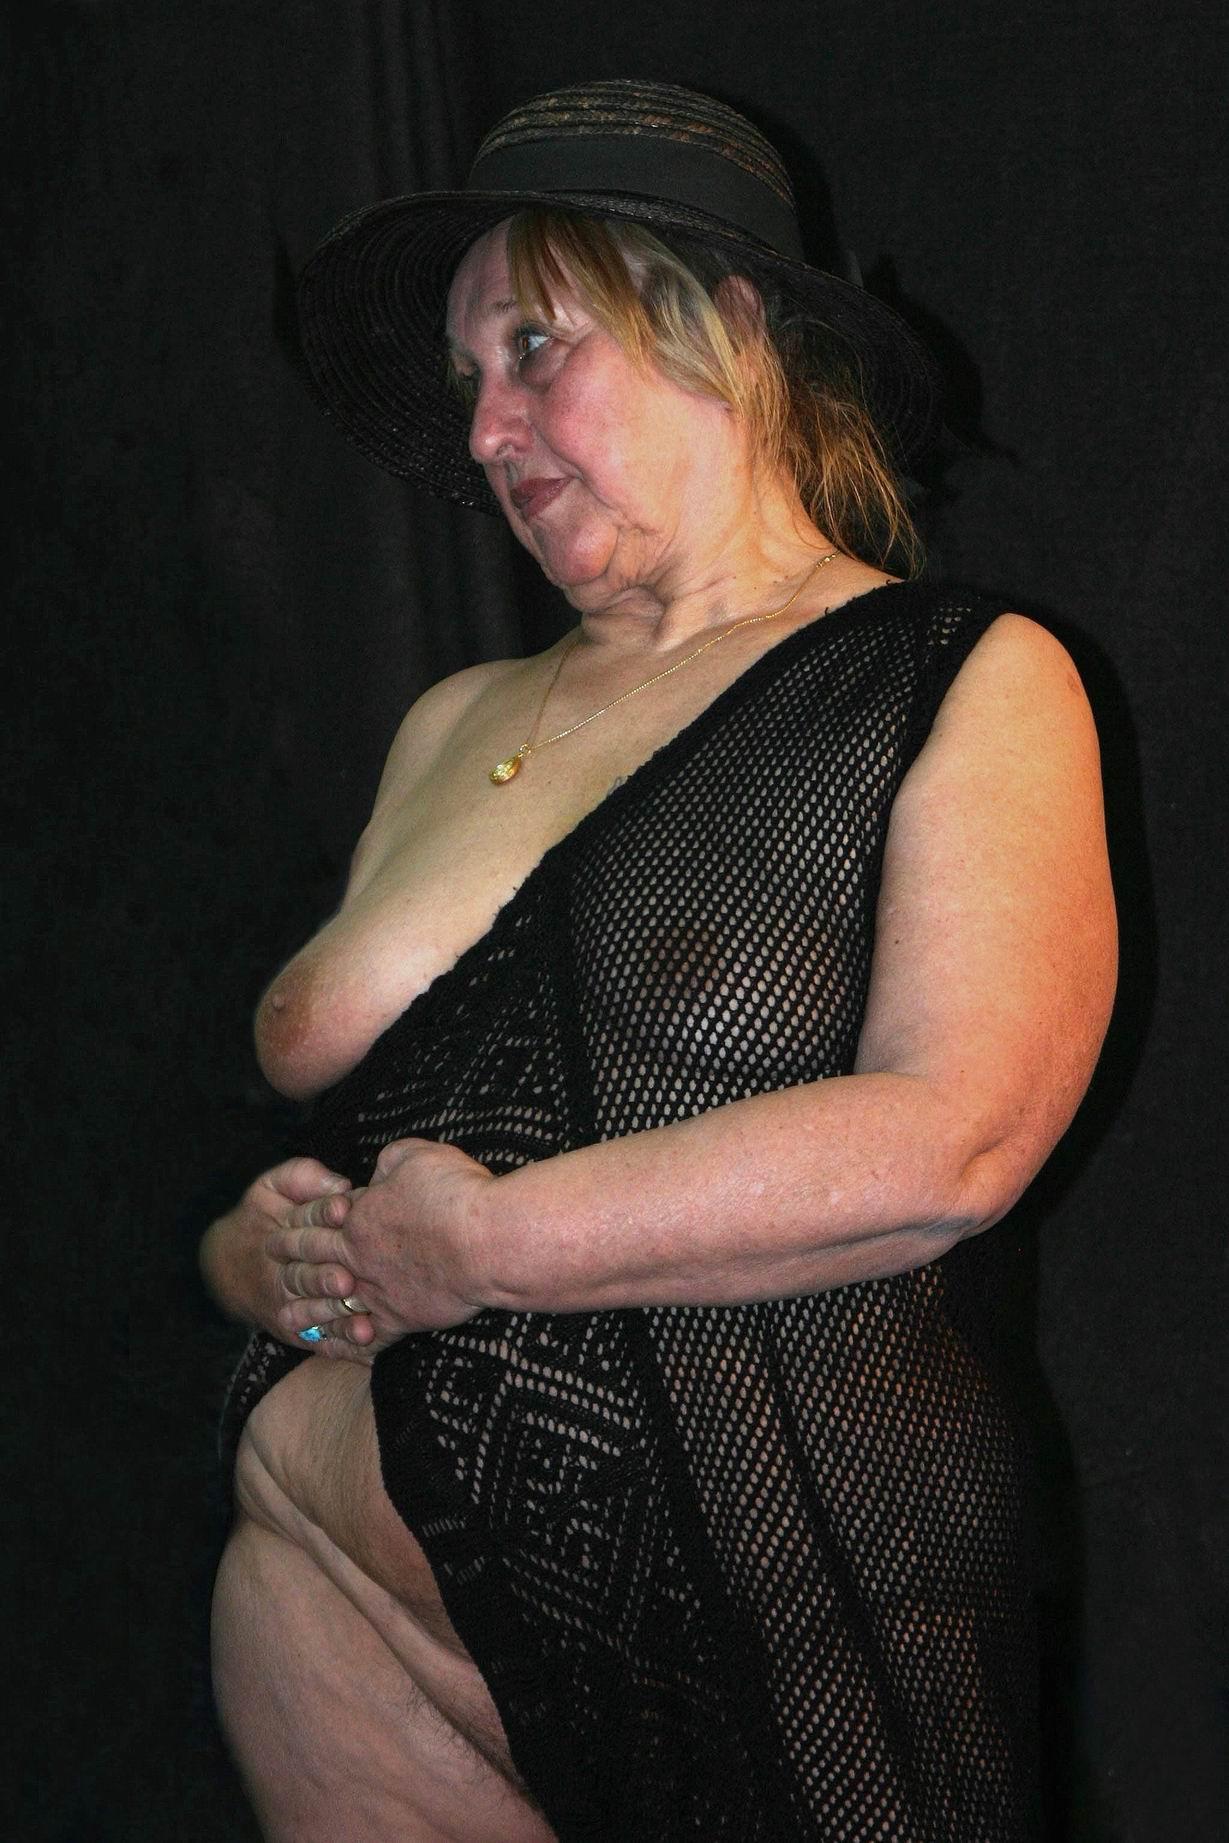 Fat link movie slut consider, that